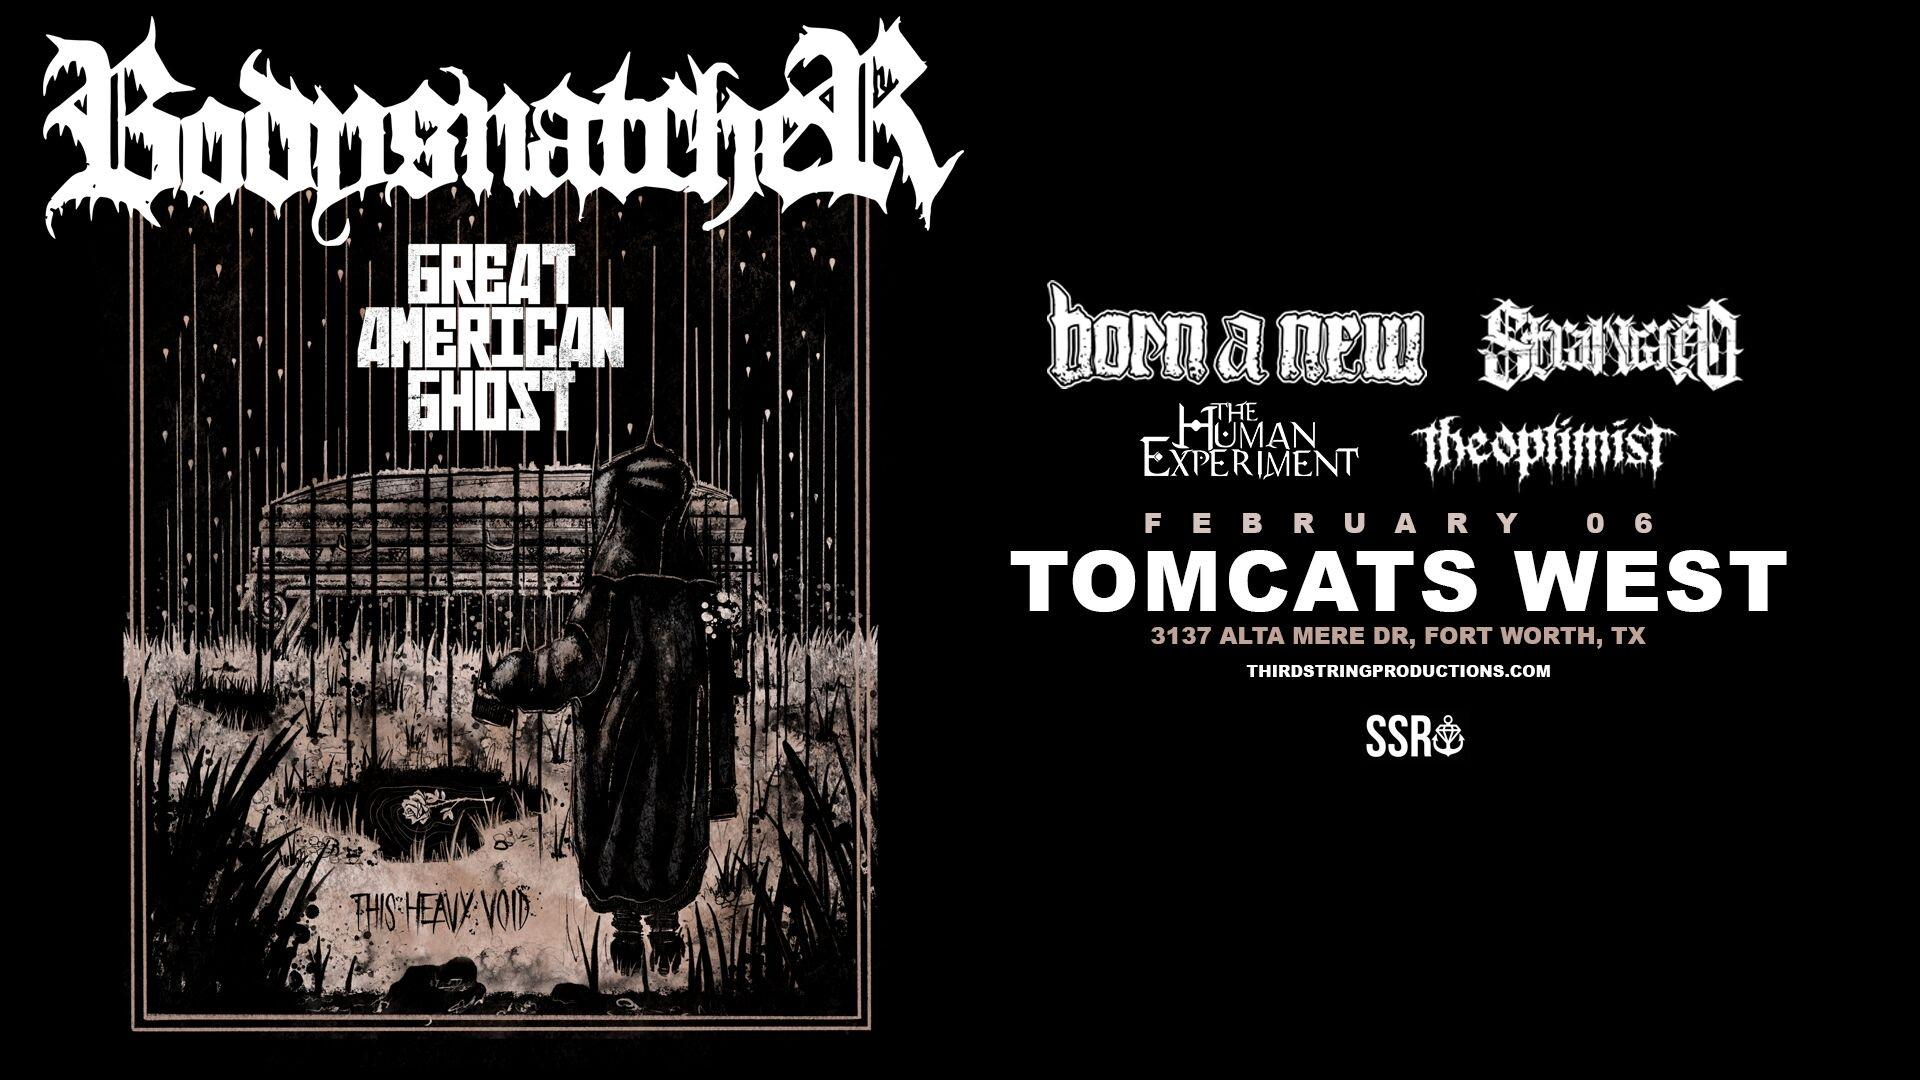 Bodysnatcher at Tomcats West